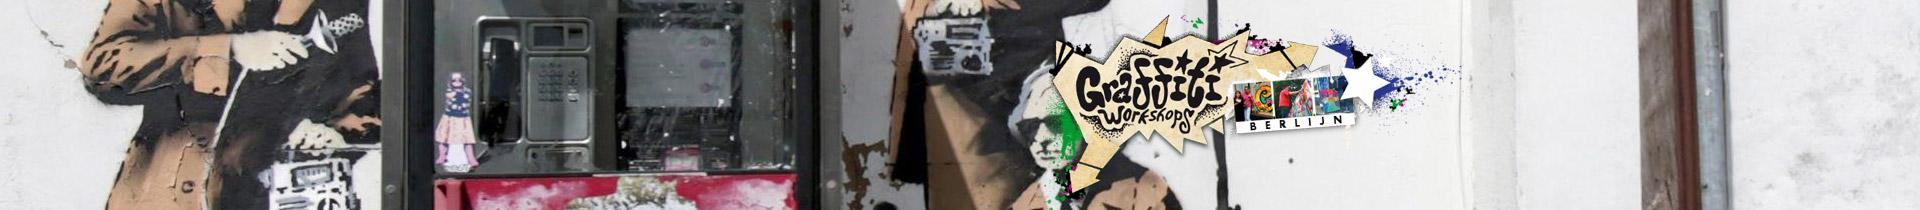 https://www.graffitiworkshopsberlijn.nl/wp-content/uploads/2015/05/contact.jpg